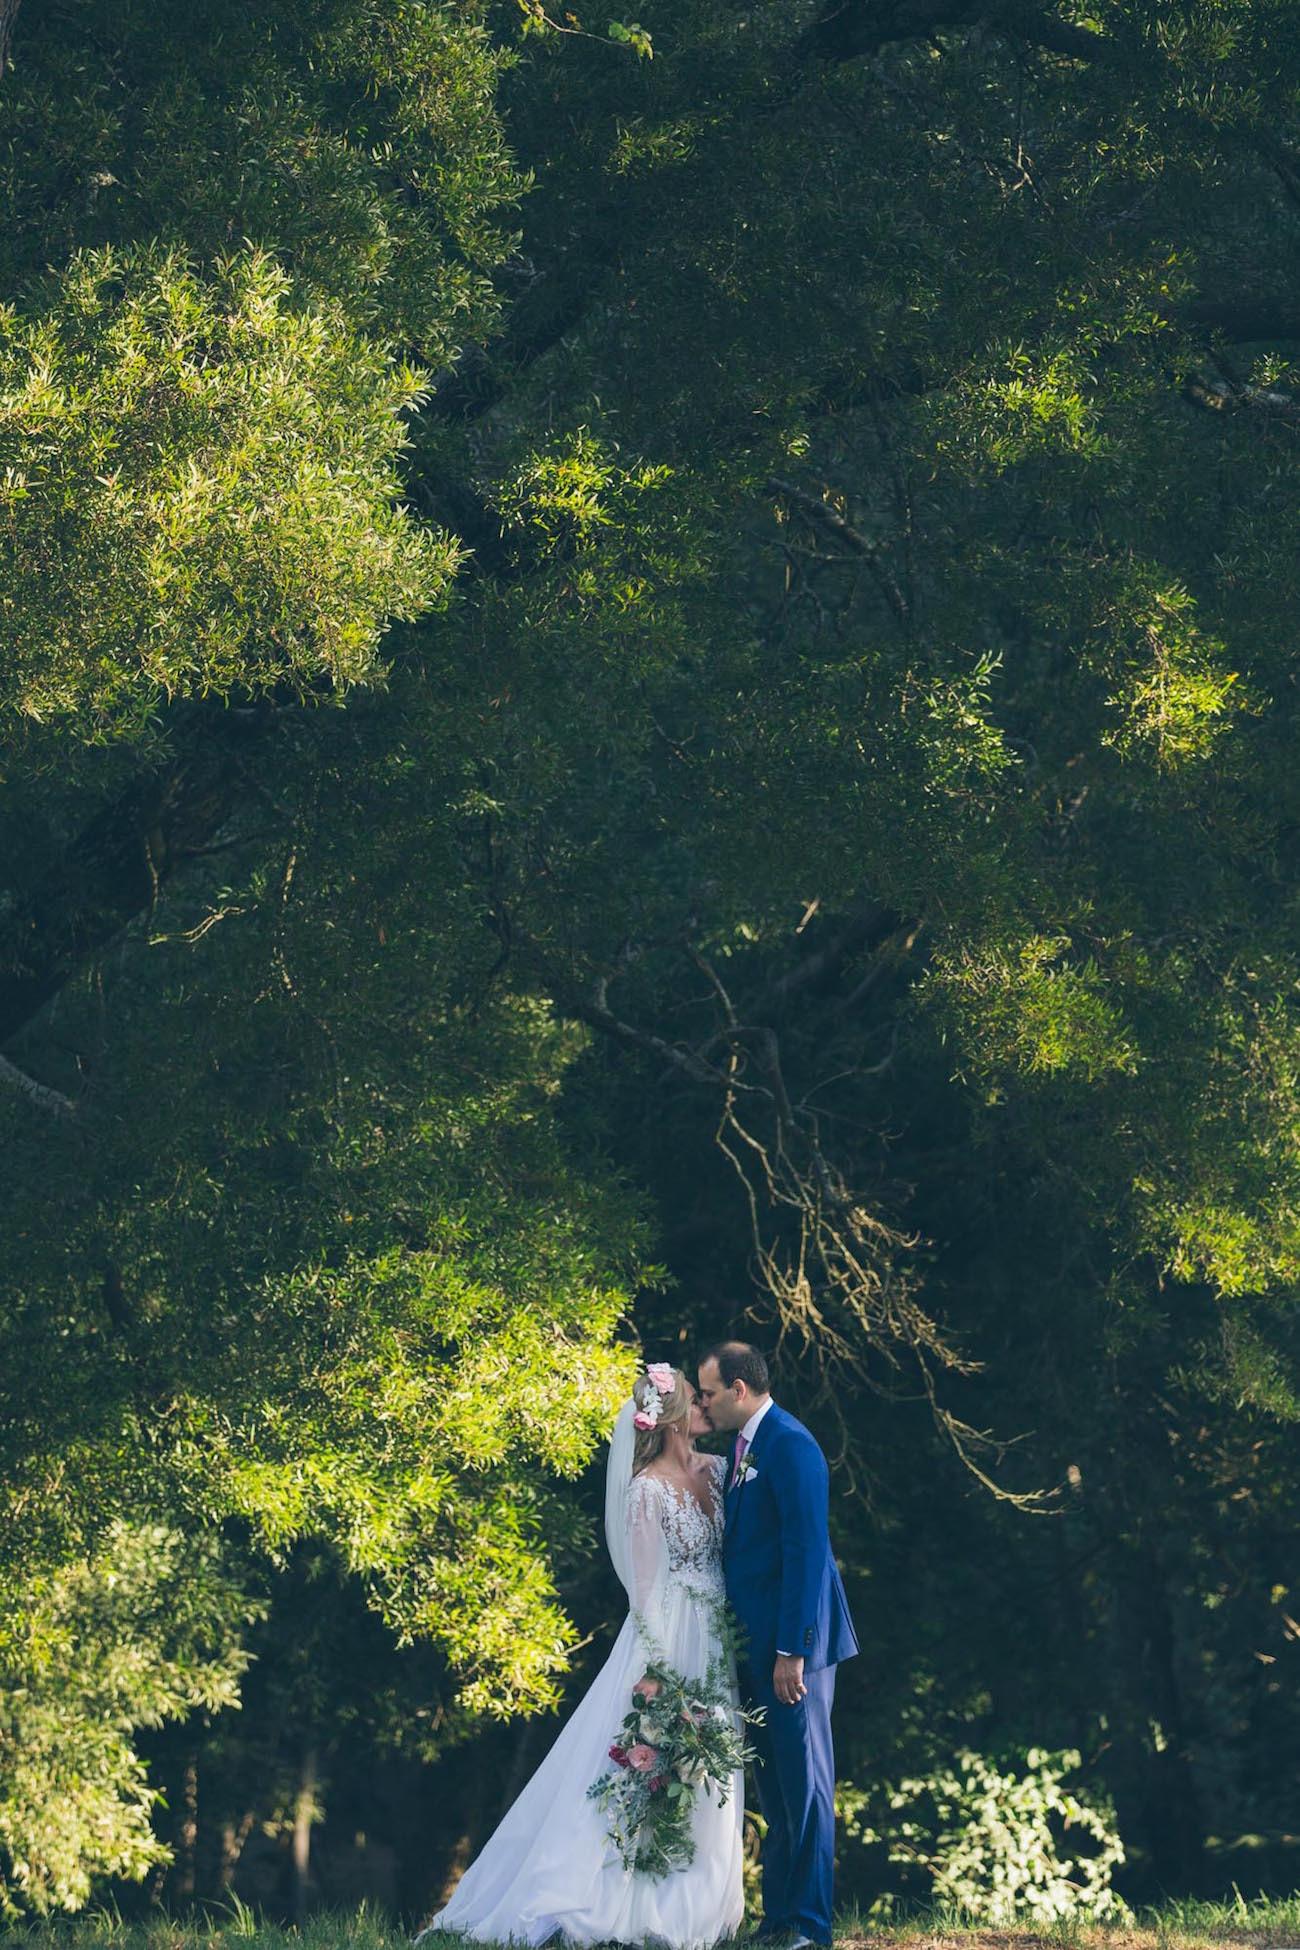 Bride and Groom | Credit: Shanna Jones